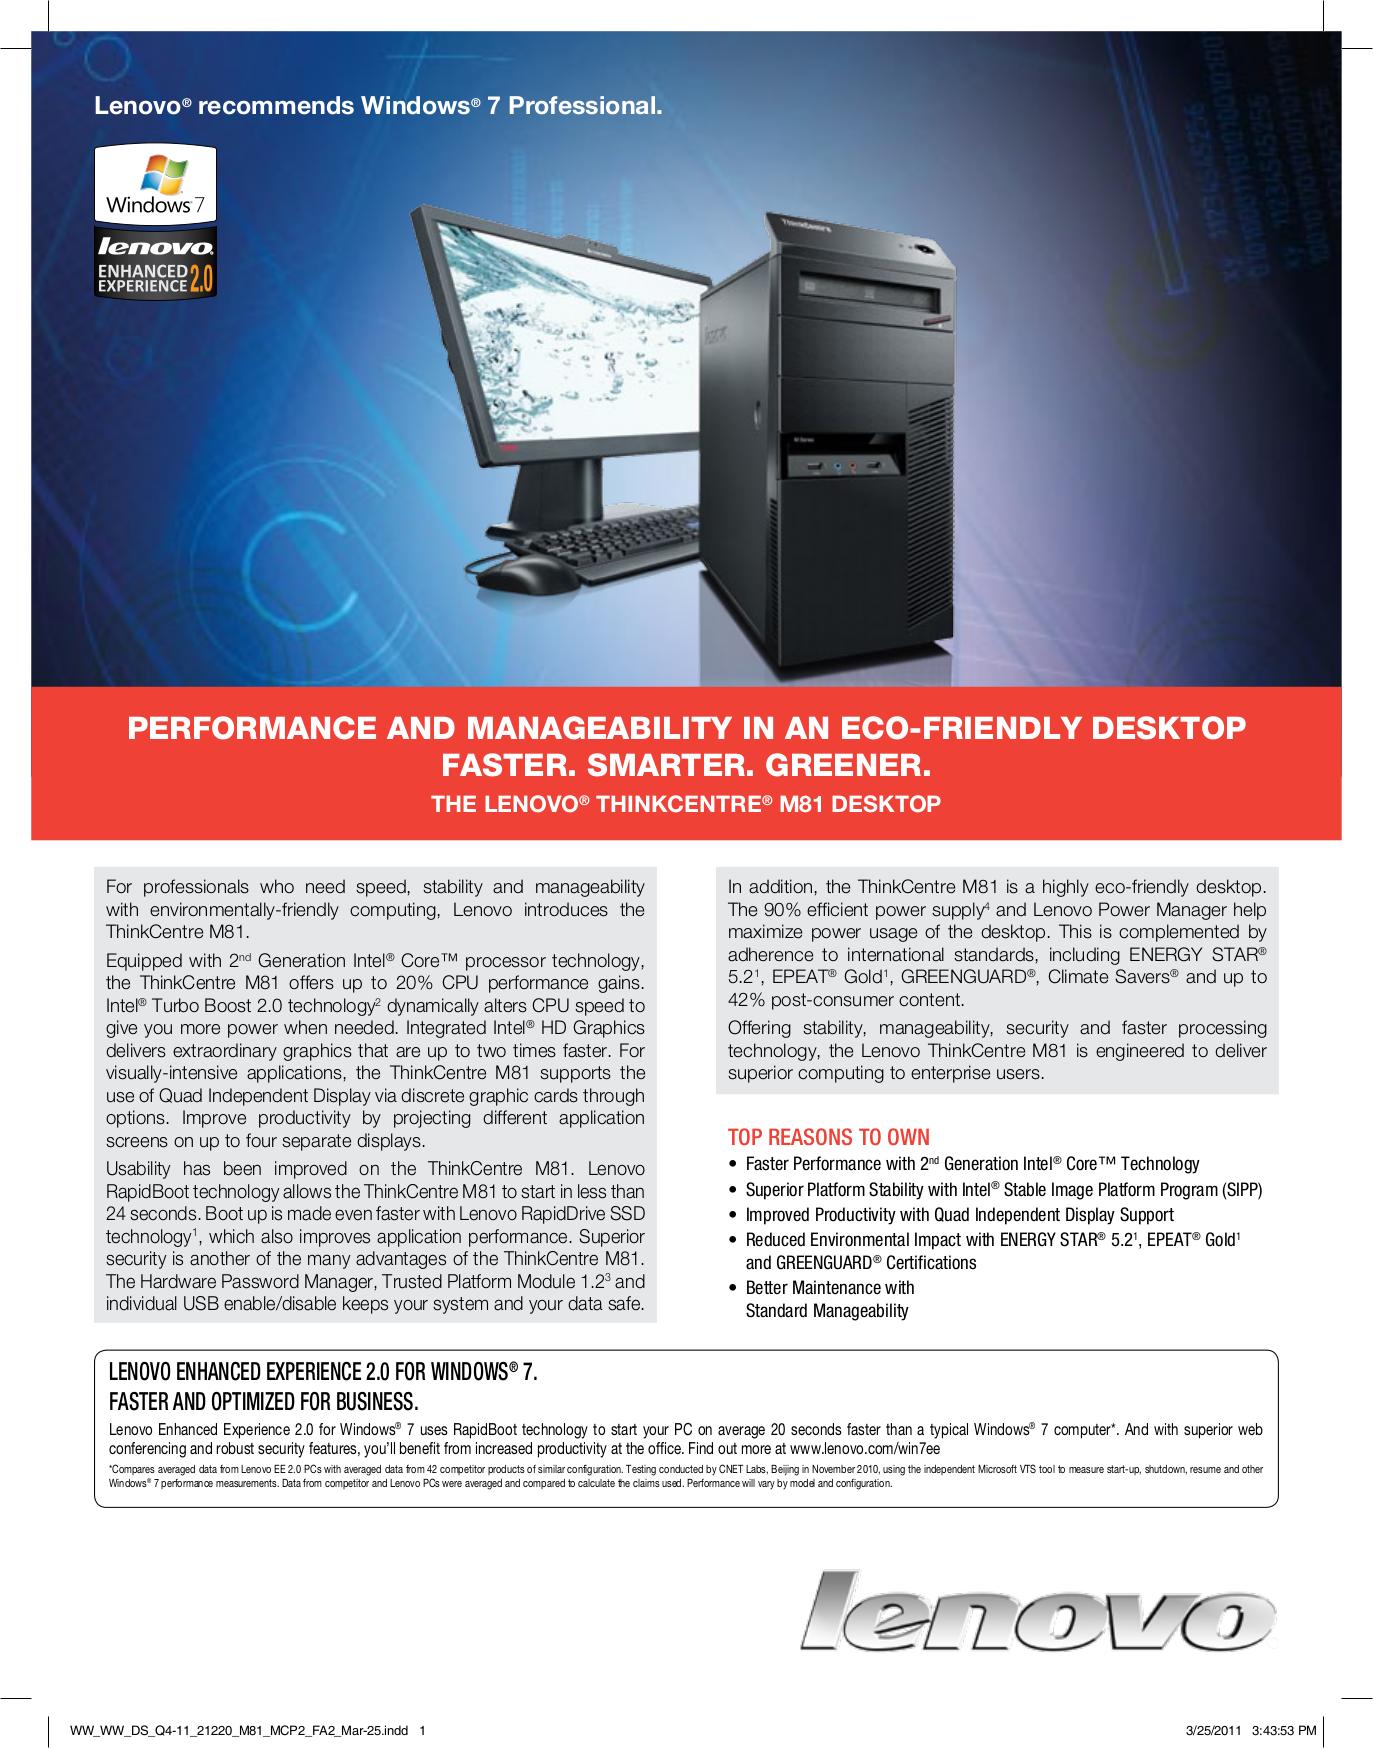 pdf for Lenovo Desktop ThinkCentre M81 5032 manual